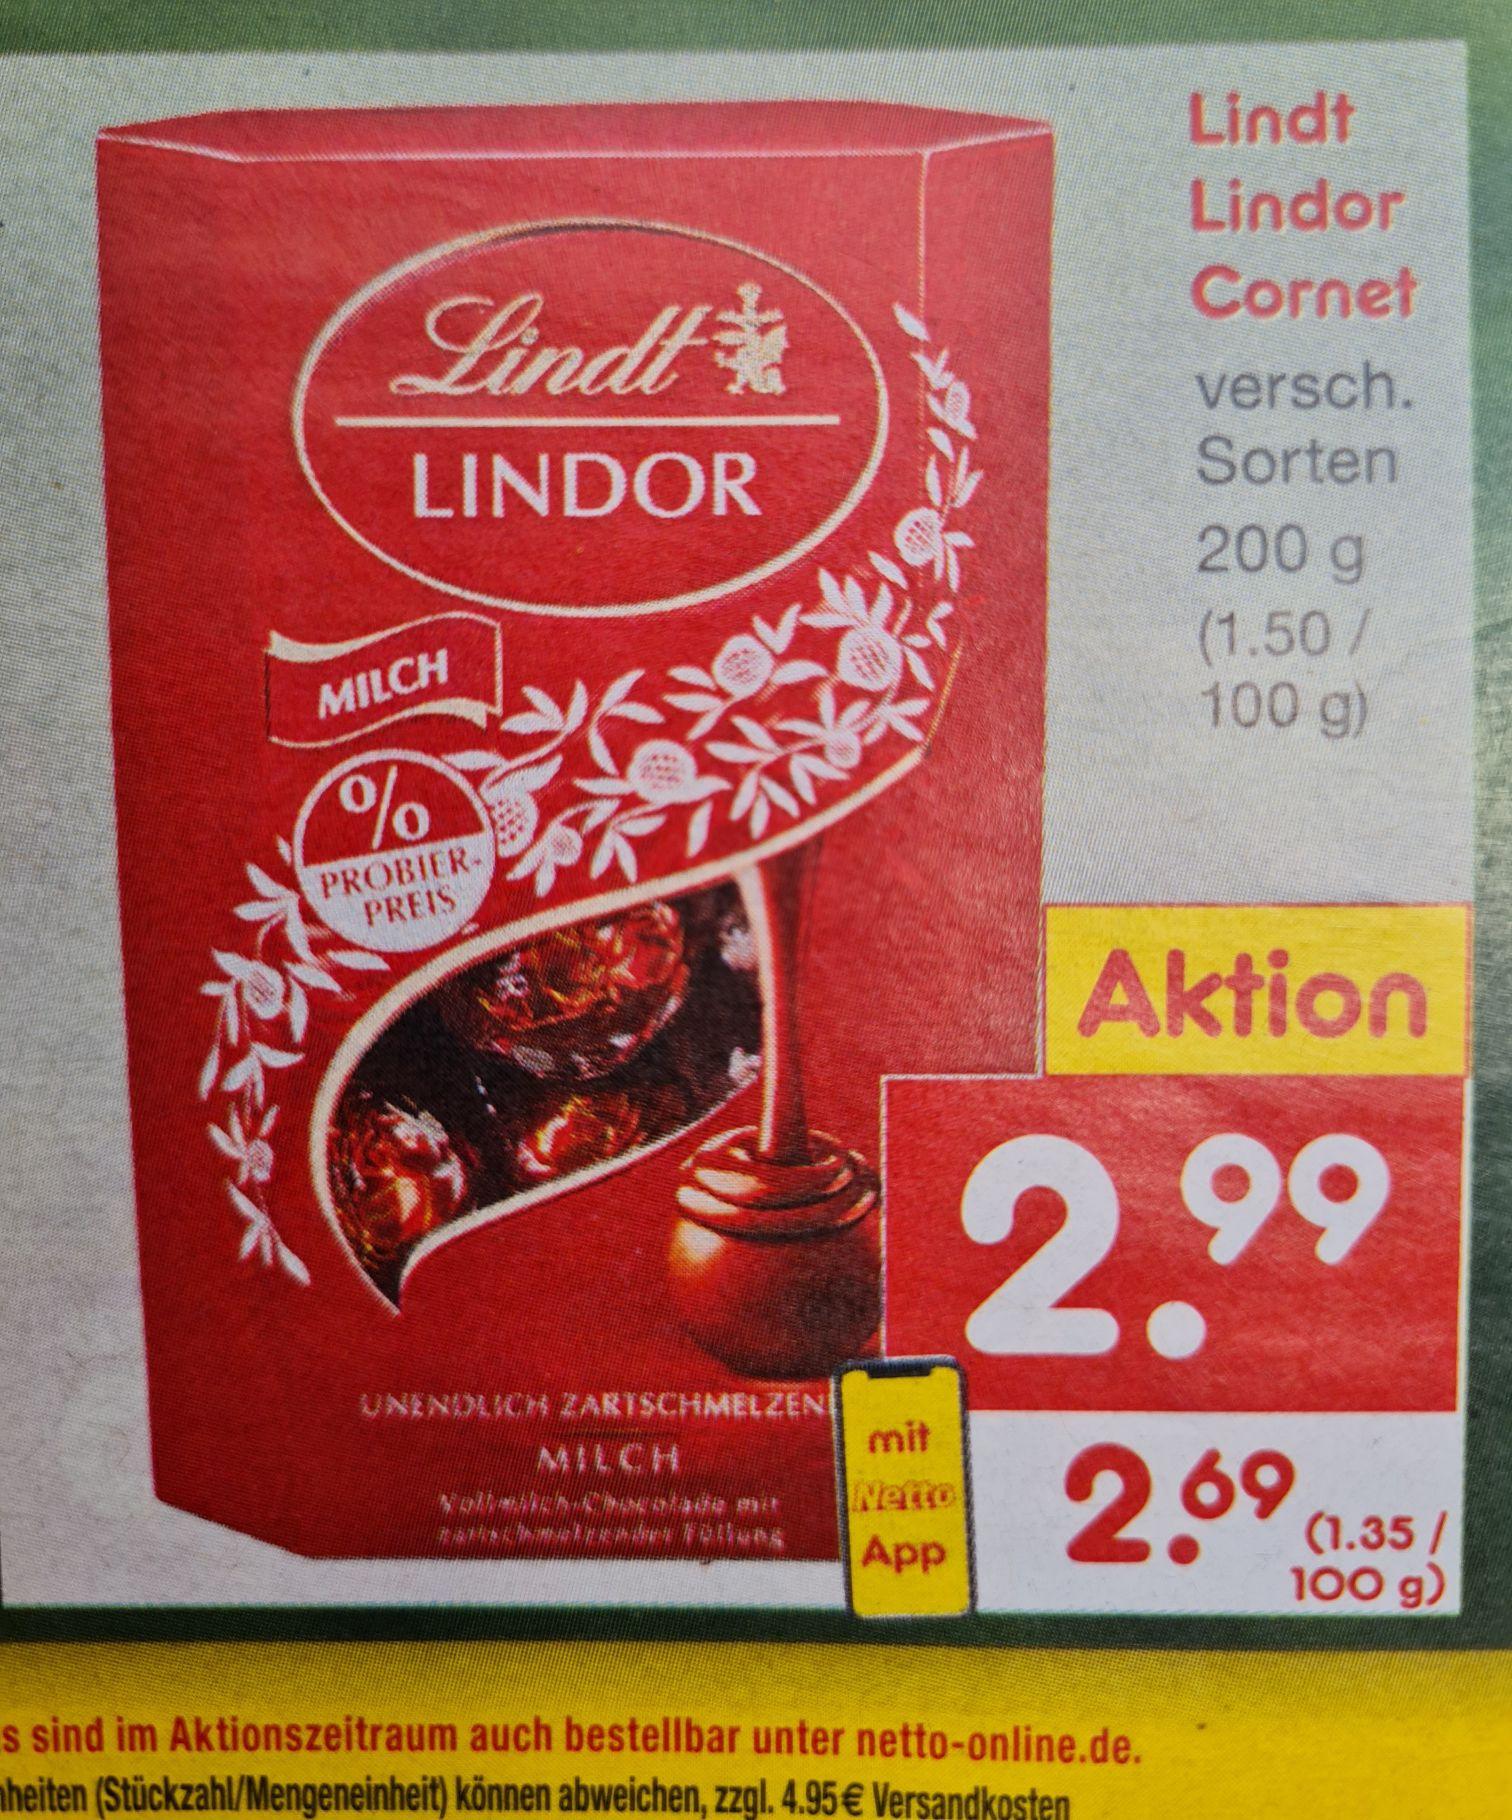 Lindt Lindor Cornet 200 g mit Netto App 2,69€ (13,45 kg) verschiedene Sorten ab 14.06 Netto MD